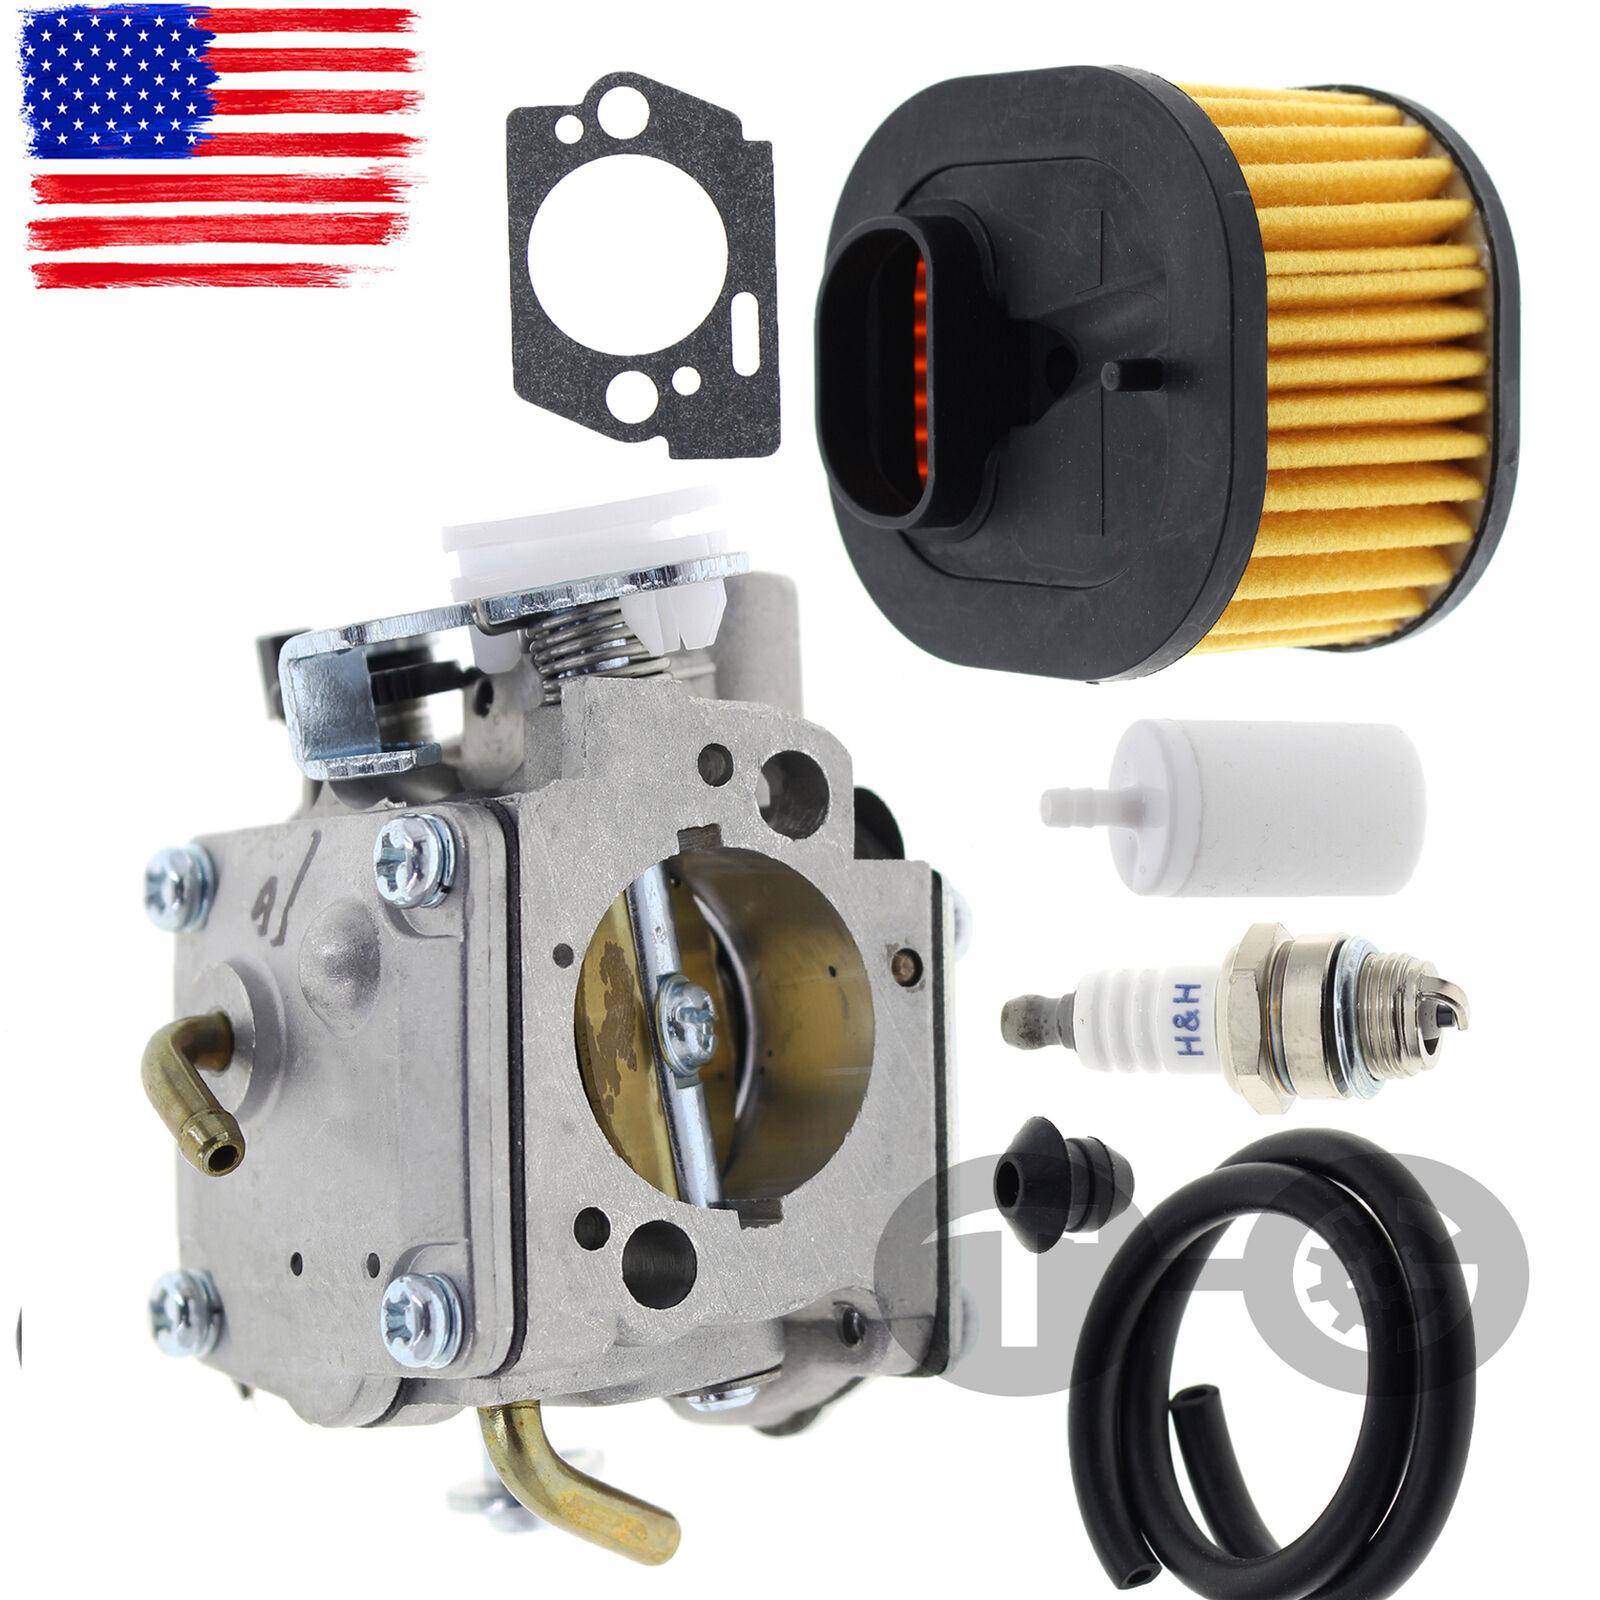 Patio, Lawn & Garden Mowers & Outdoor Power Tools OEM Carburetor ...